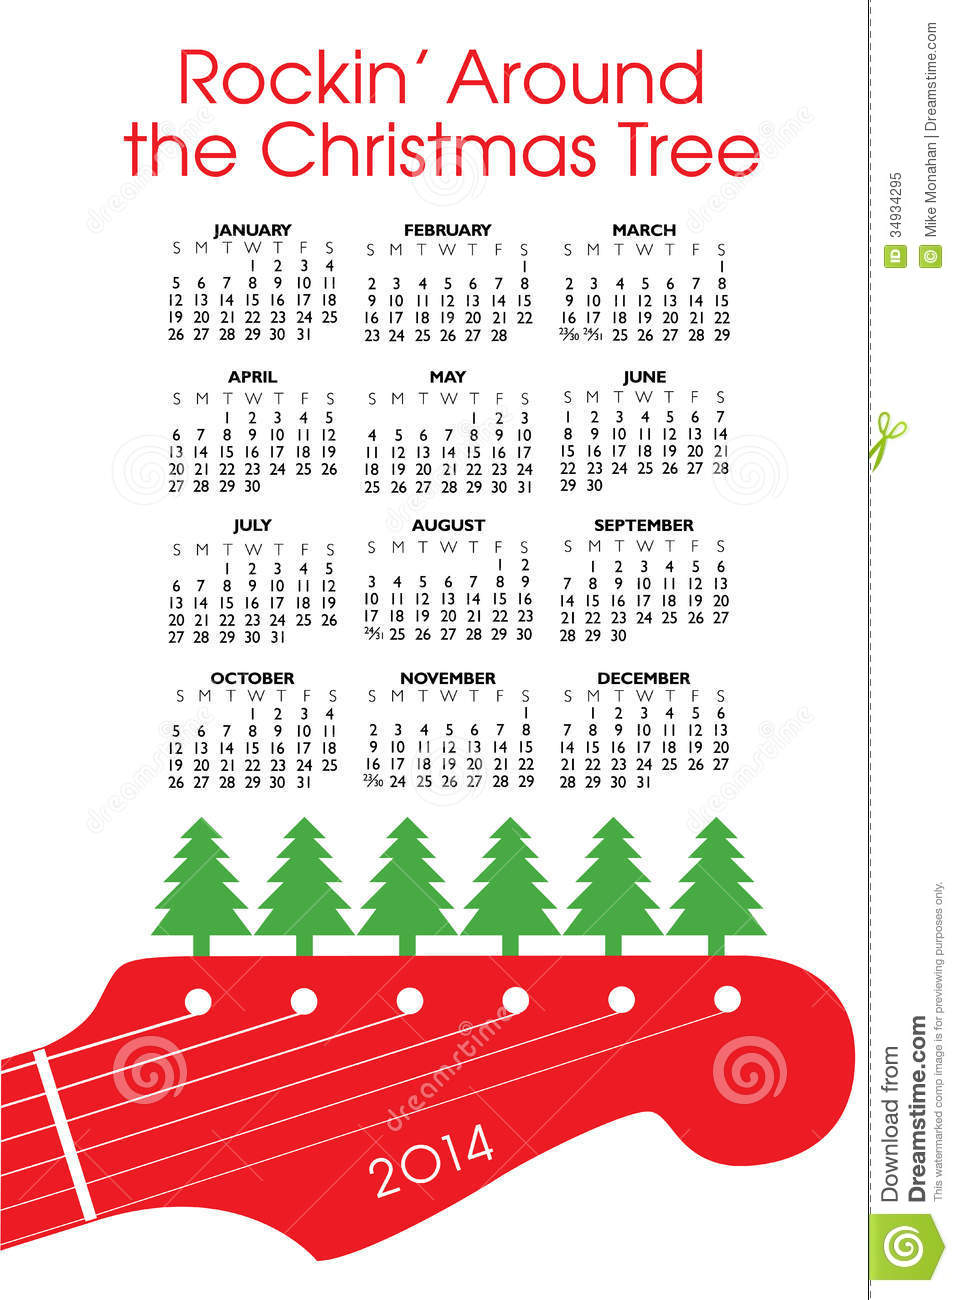 2014 Christmas Calendar Royalty Free Stock Photo.